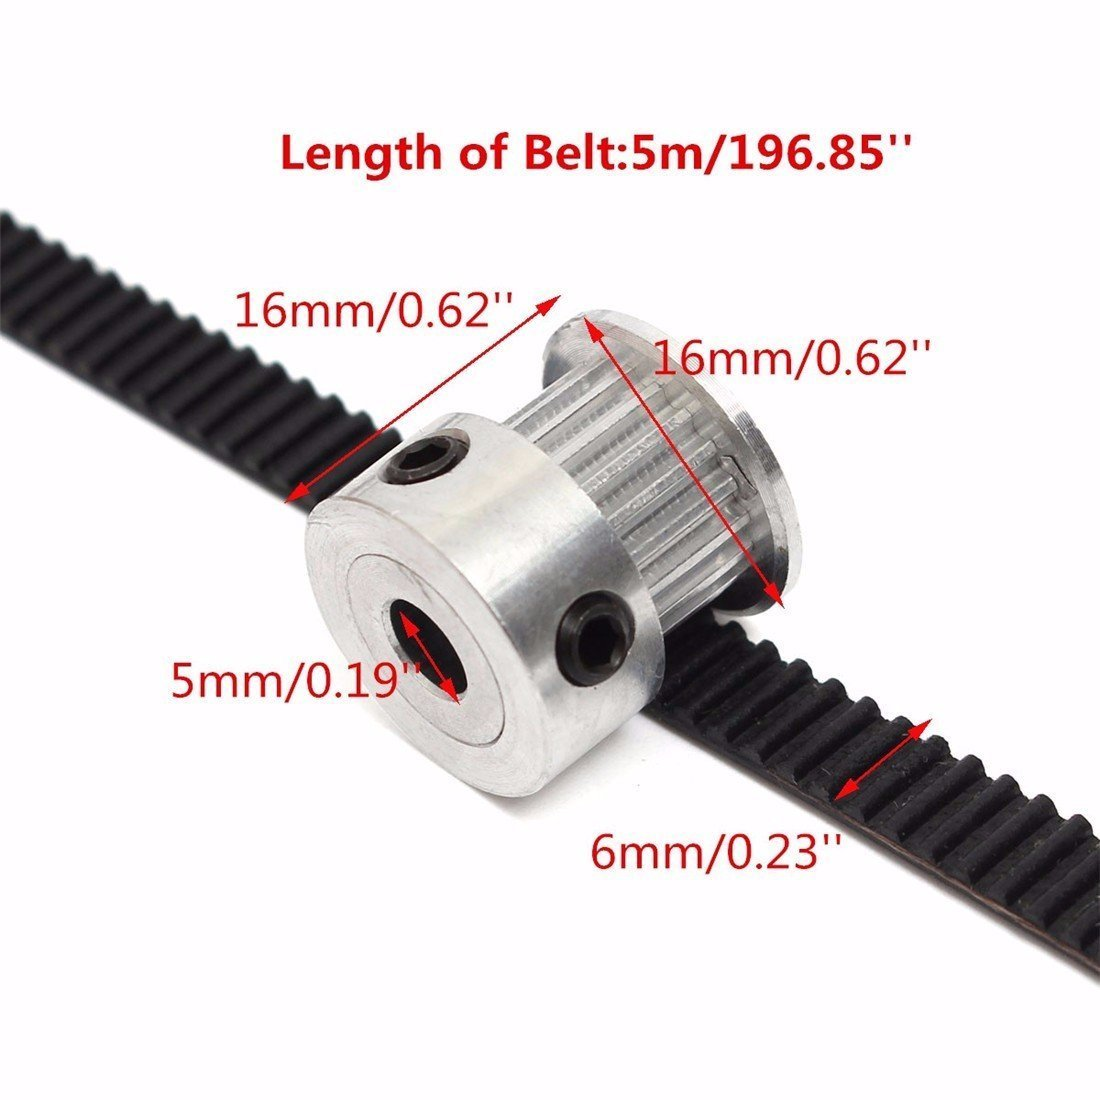 2 m GT2-6 mm goma cintur/ón correa dentada banda de transmisi/ón de goma JSDL 2 x GT2 20-dientes 3D-impresora de correa